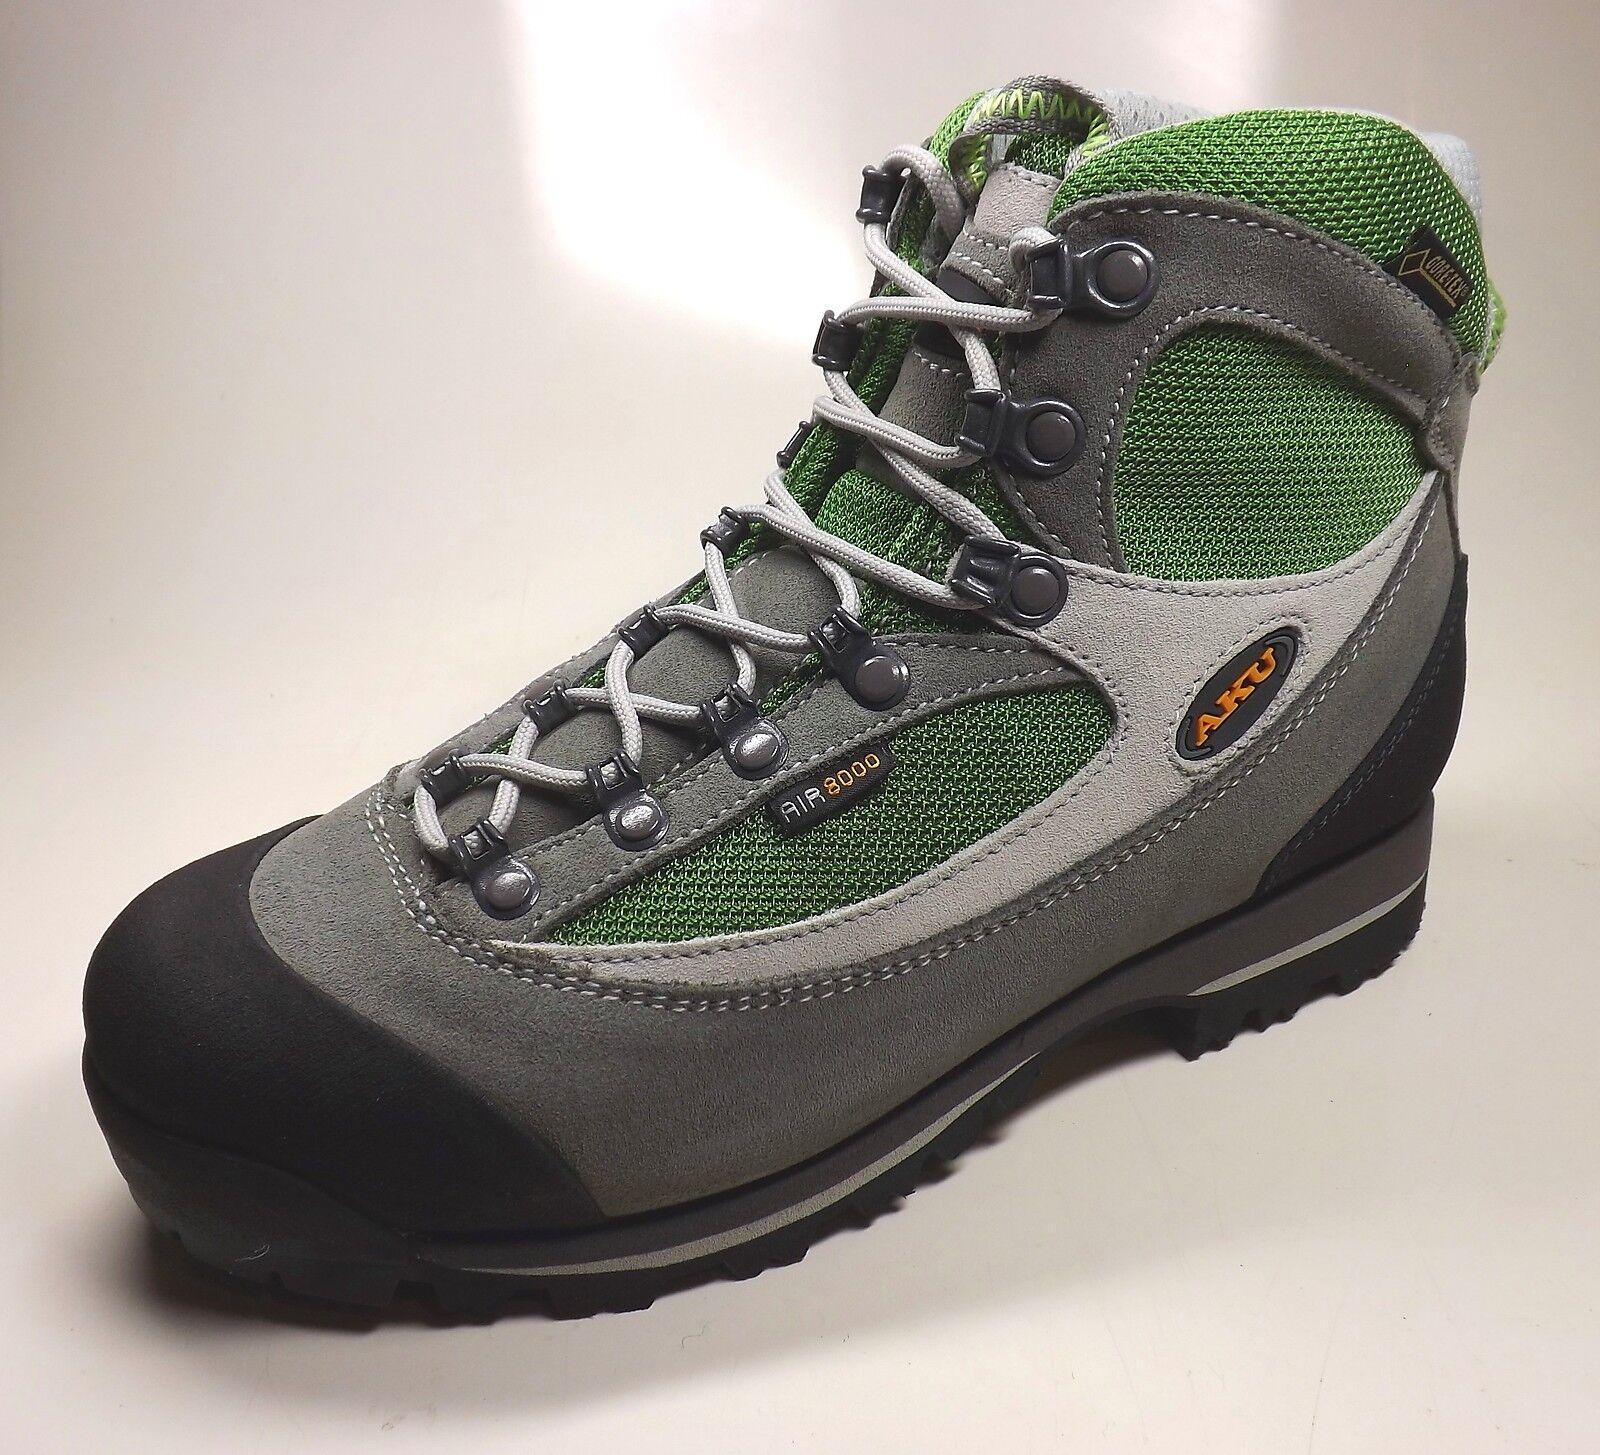 Aku Trekker Lite II GTX Women, Trekking shoes for Ladies, Walking Boots